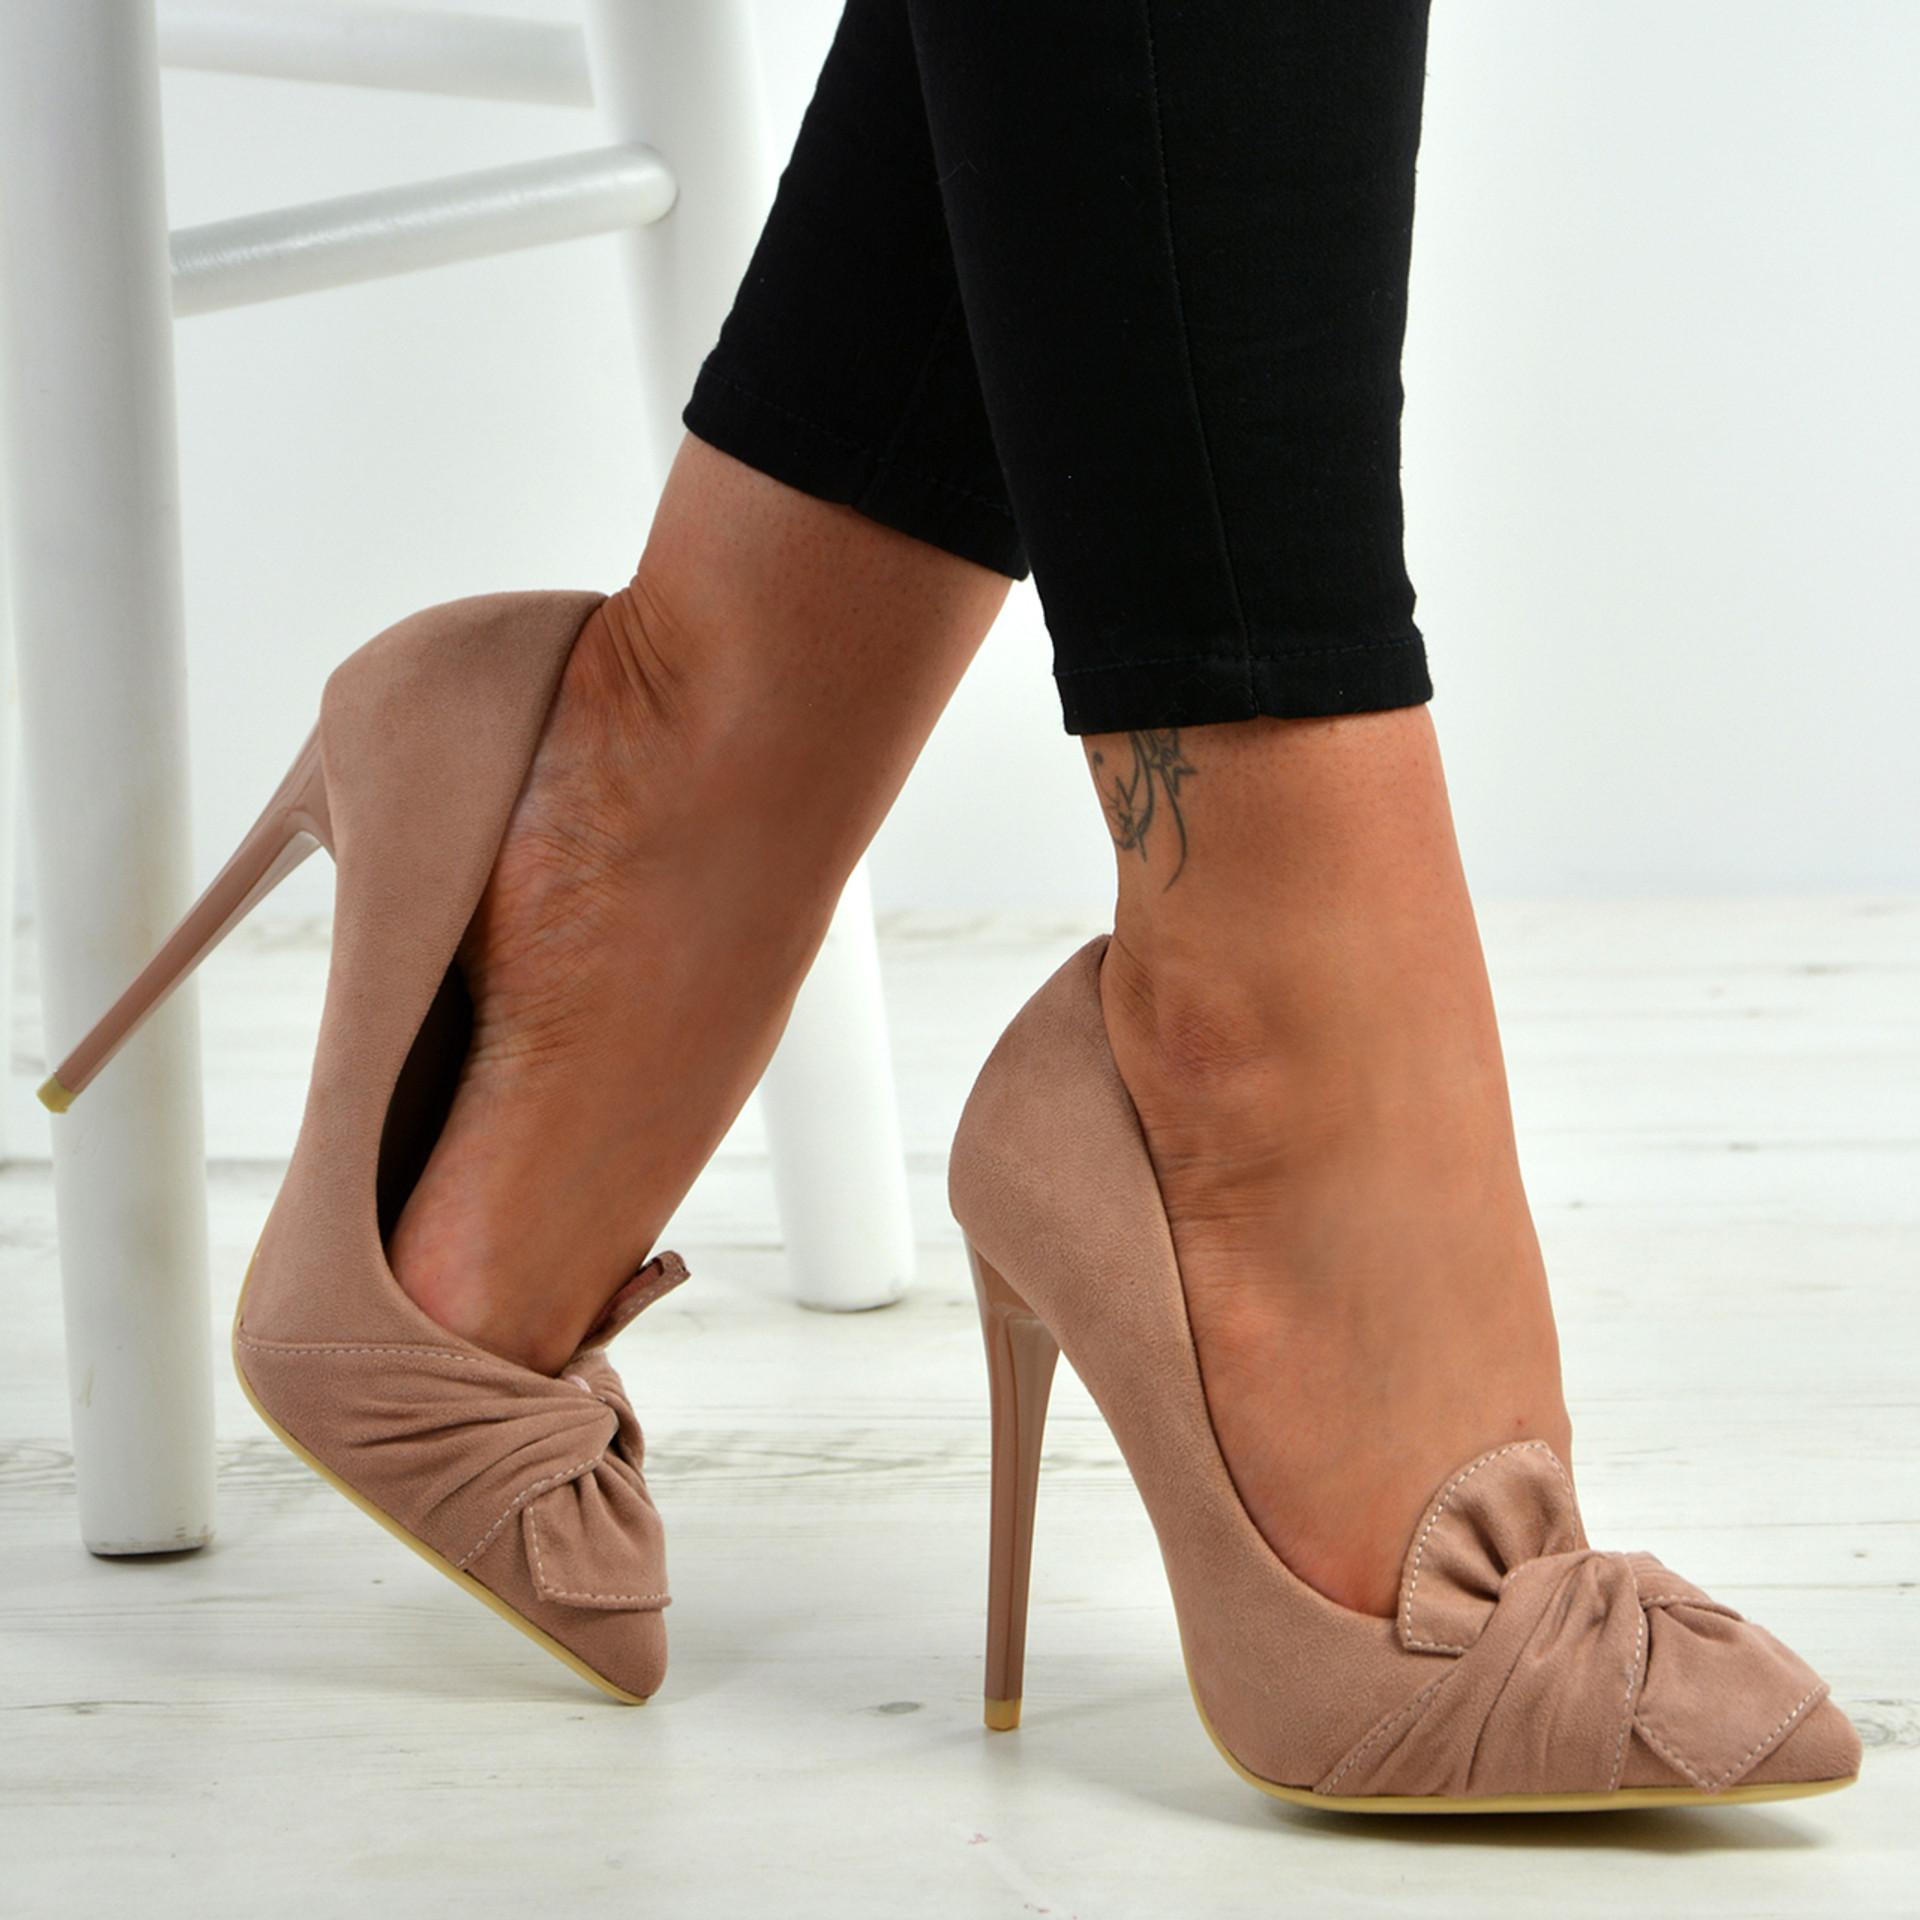 Ingrid Pink Bow Stiletto Pumps